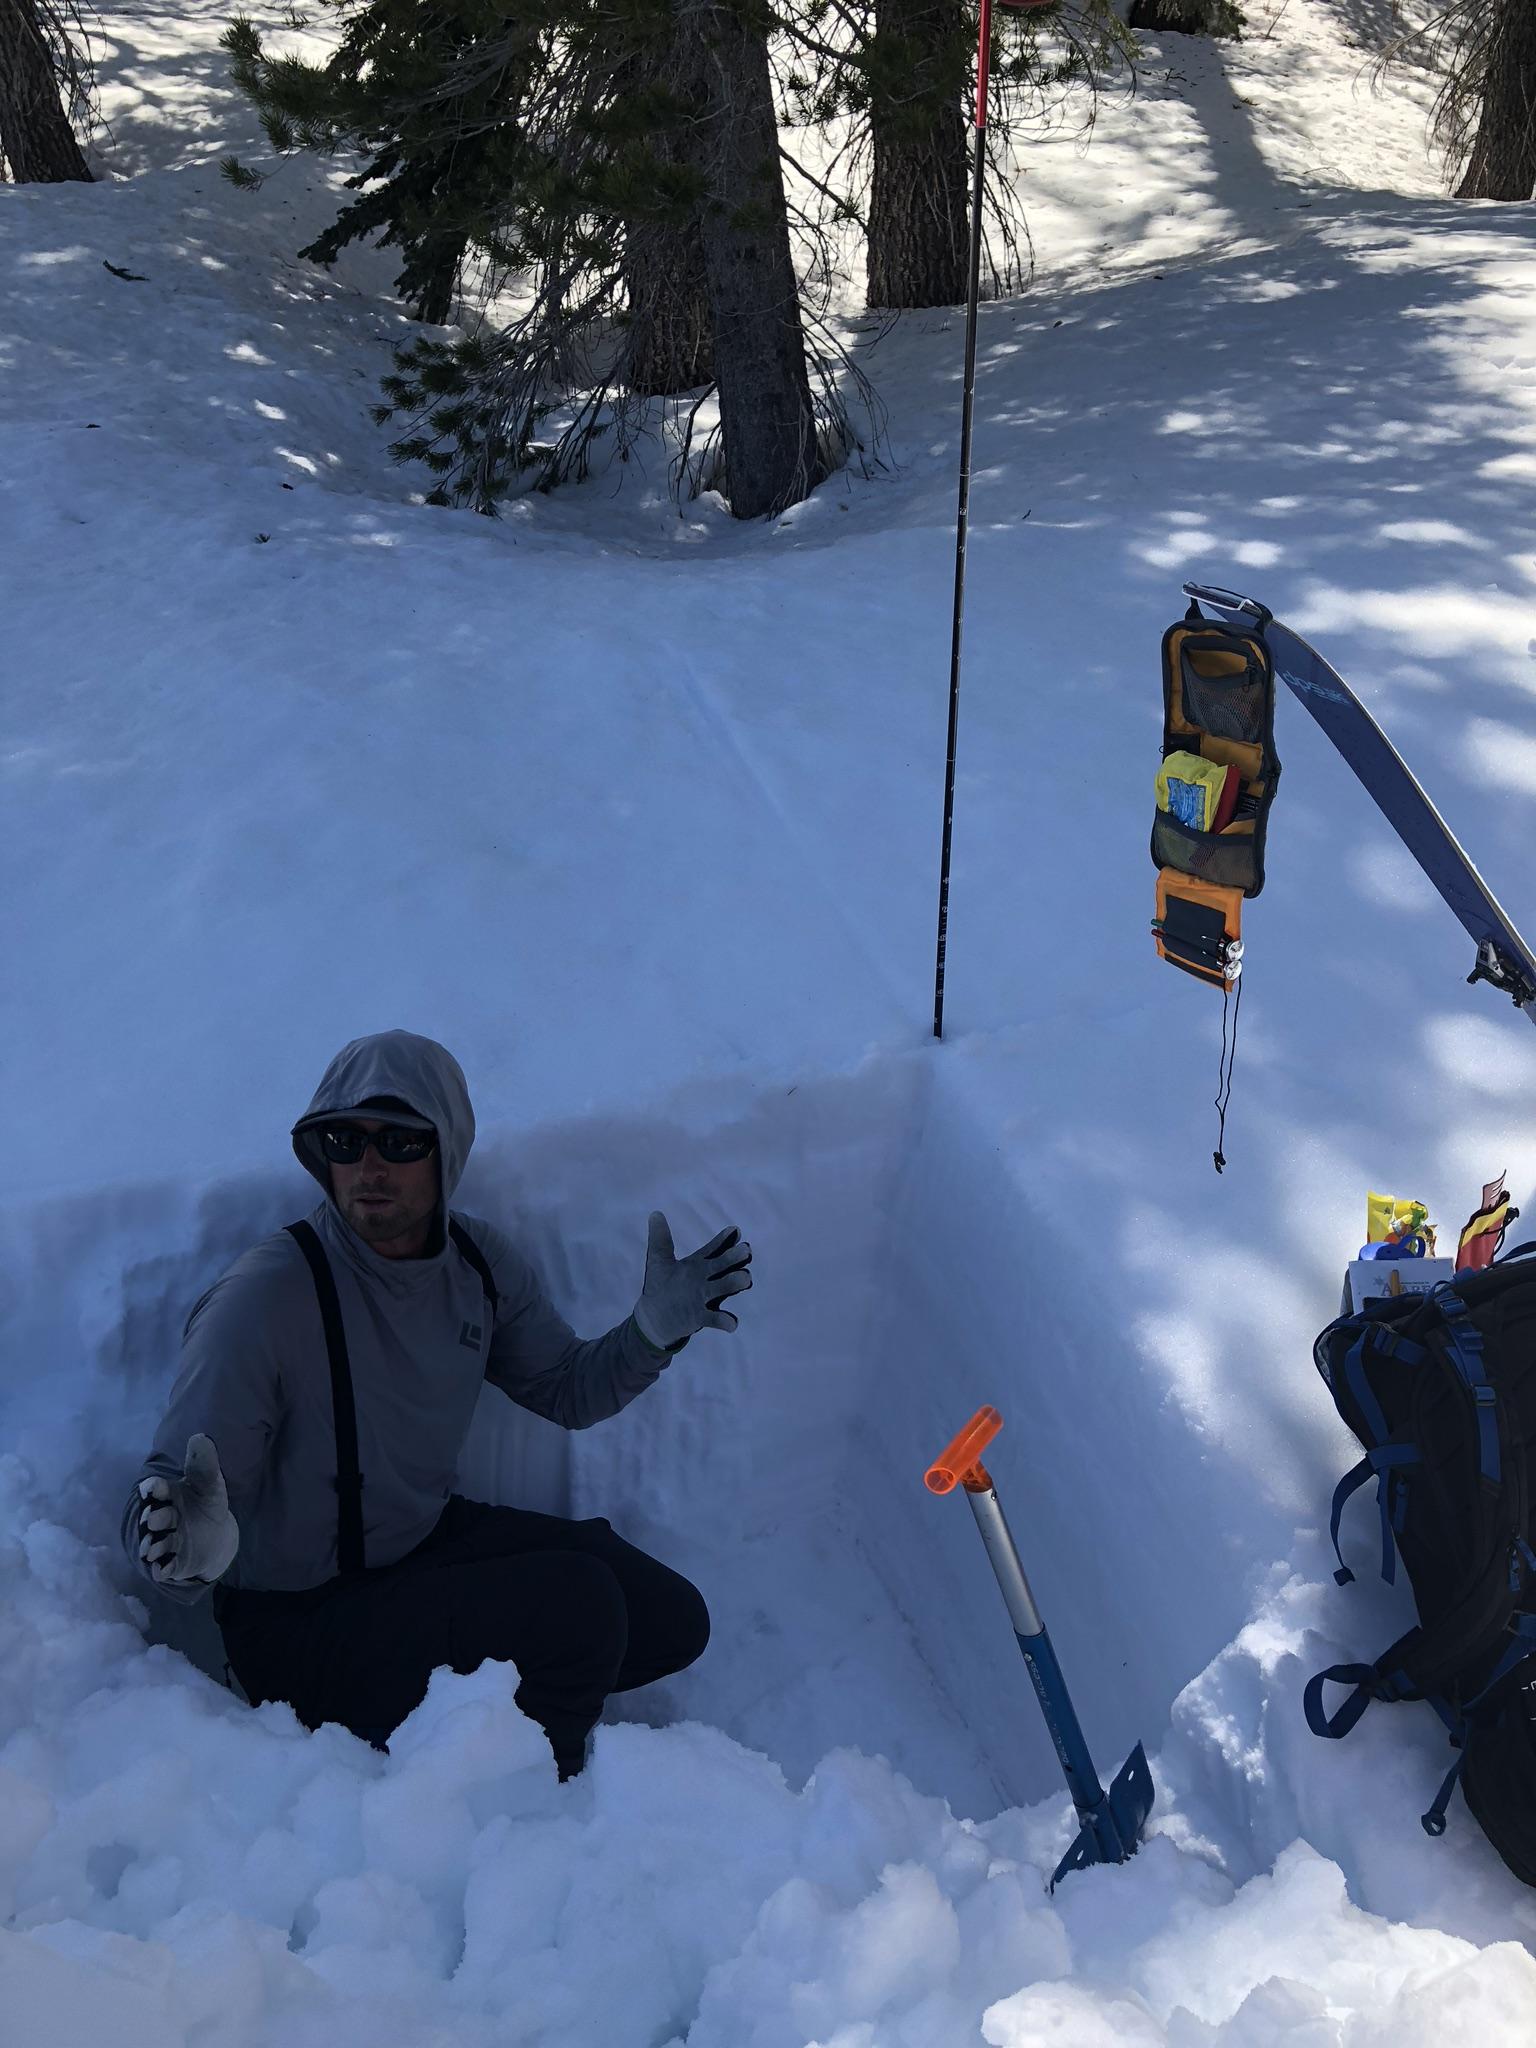 Ryan Huetter Avalanche Course Eastern Sierra Mammoth Lakes